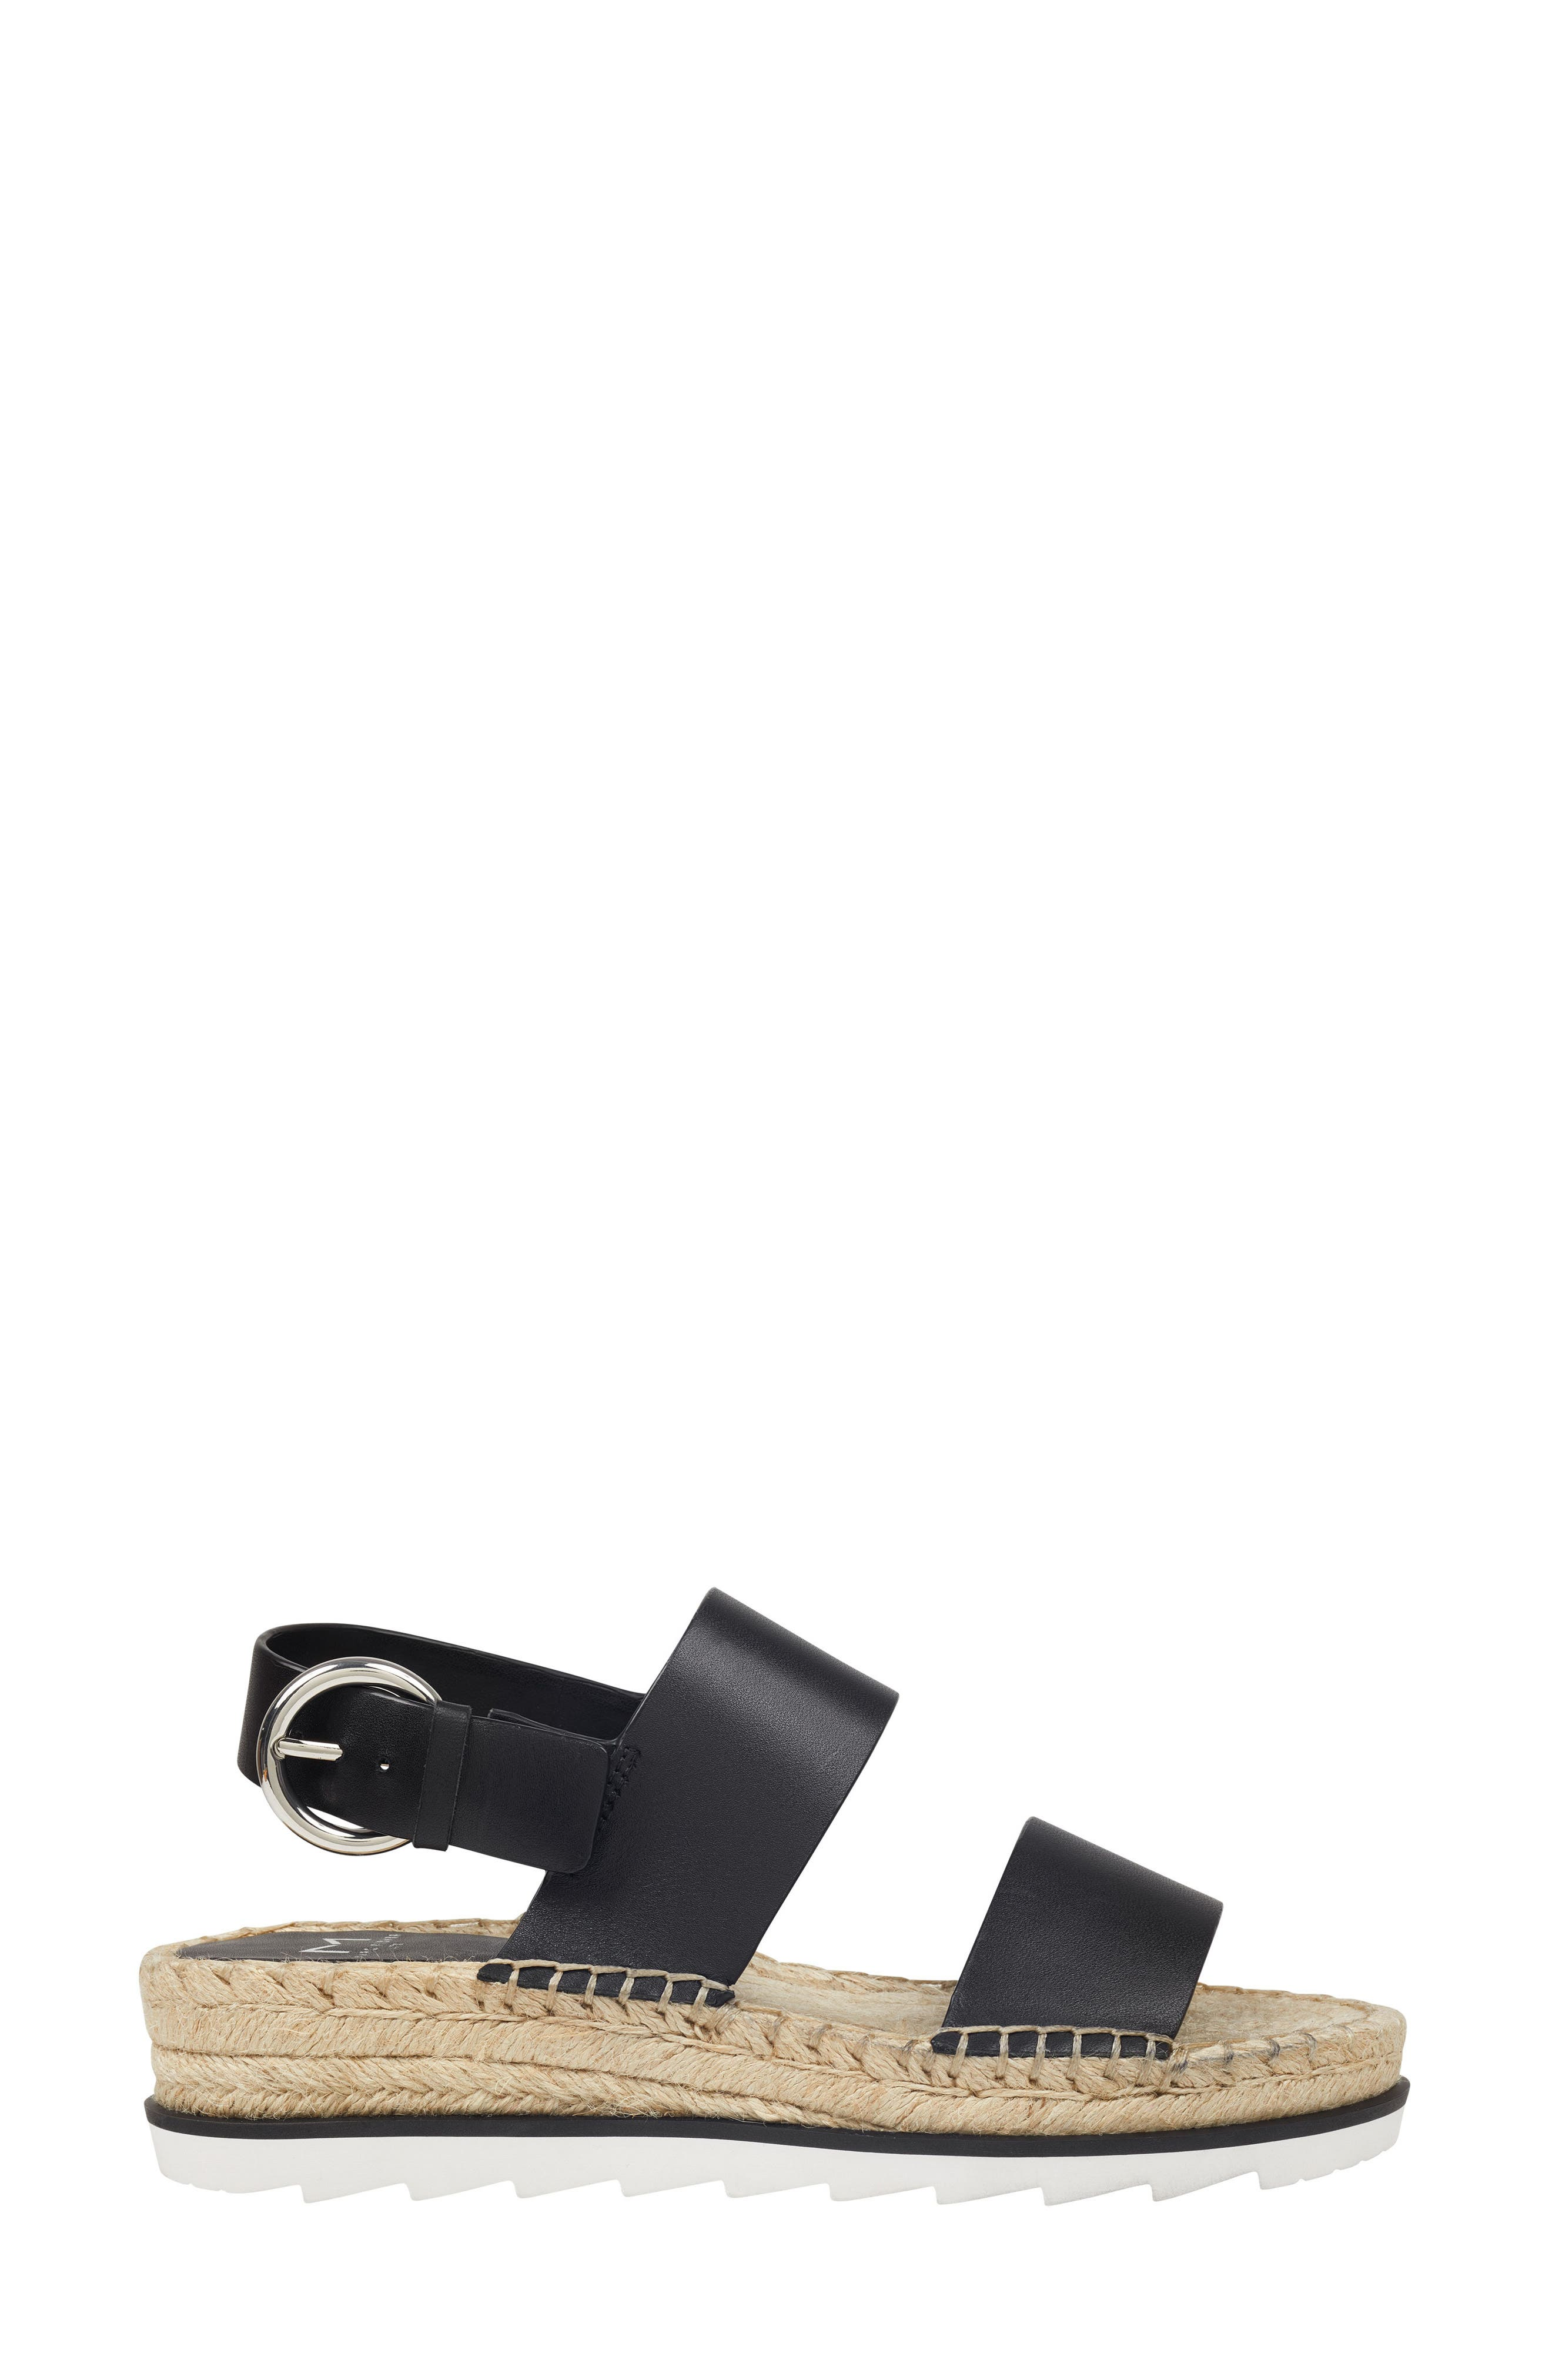 MARC FISHER LTD, Phebe 2 Espadrille Sandal, Alternate thumbnail 3, color, BLACK LEATHER